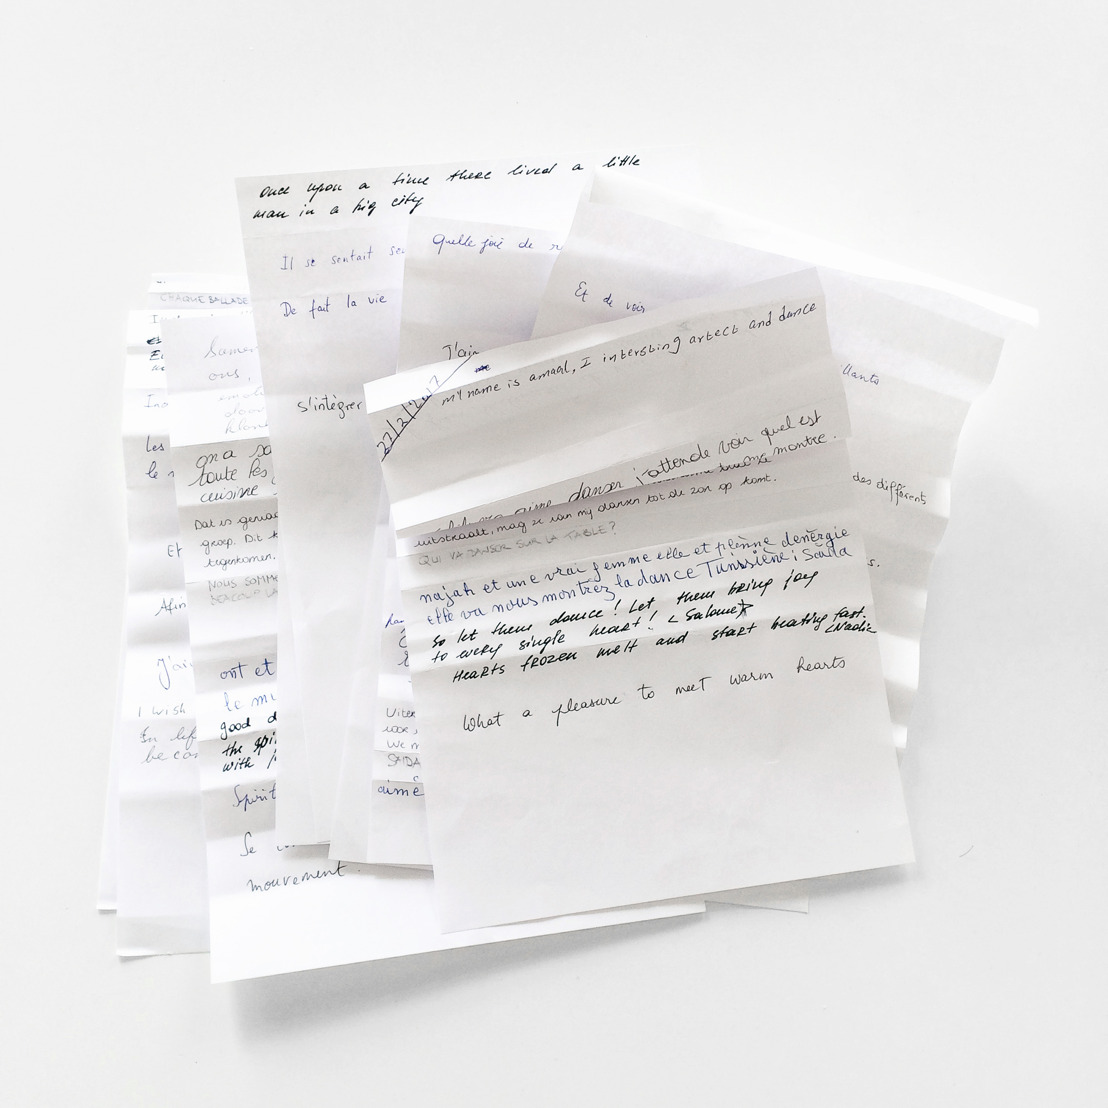 Hana Miletic + Globe Aroma - txt, Is Not Written Plain